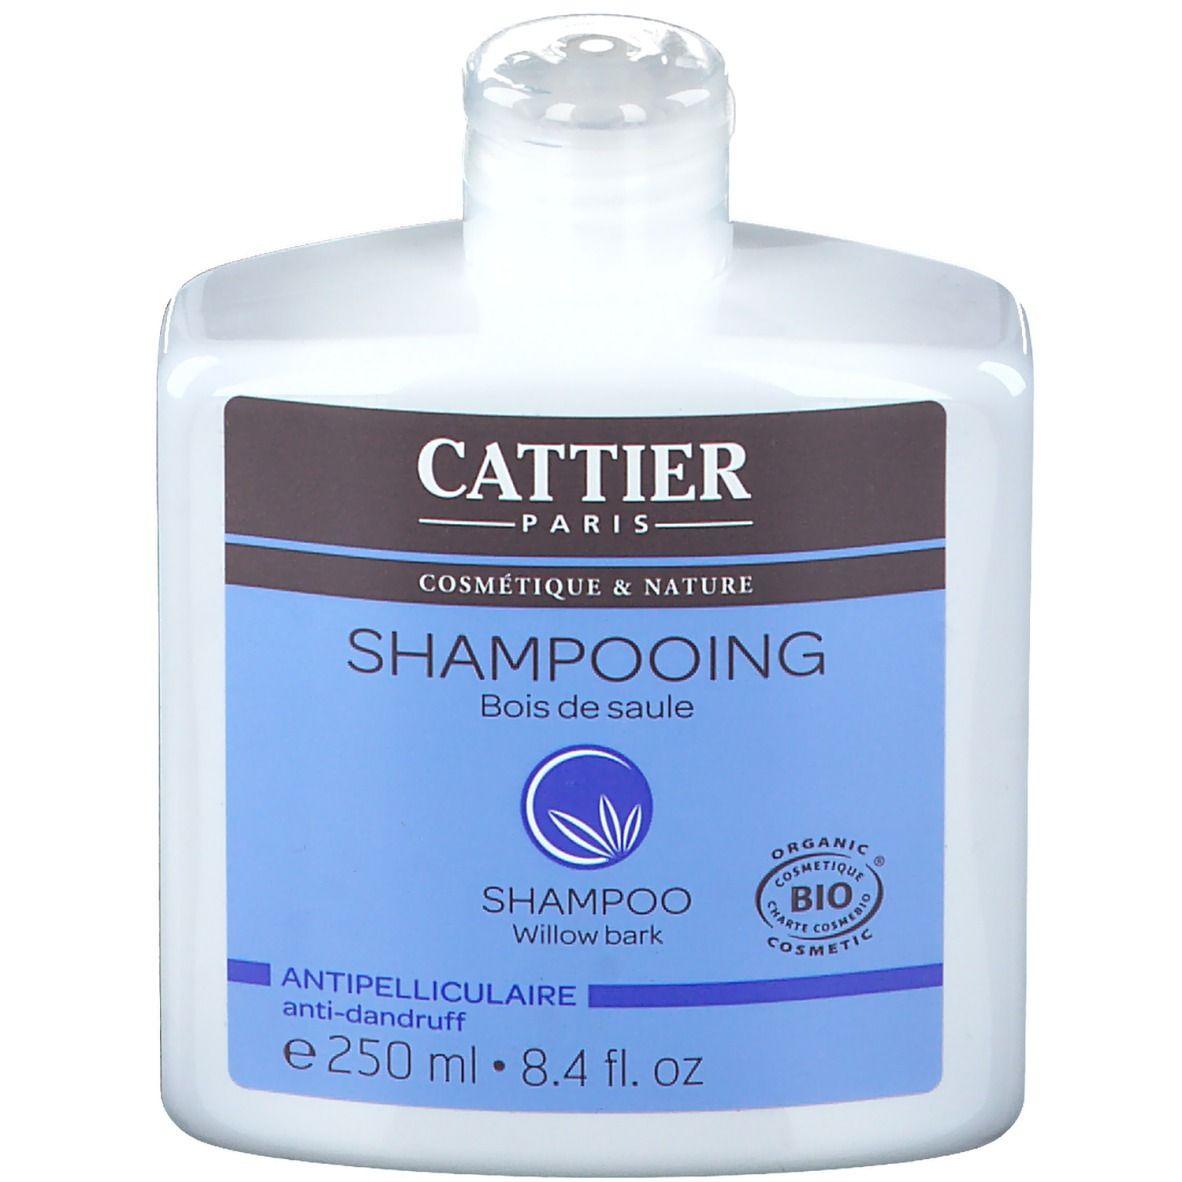 Cattier Shampoing bois de saule bio antipelliculaire ml shampooing